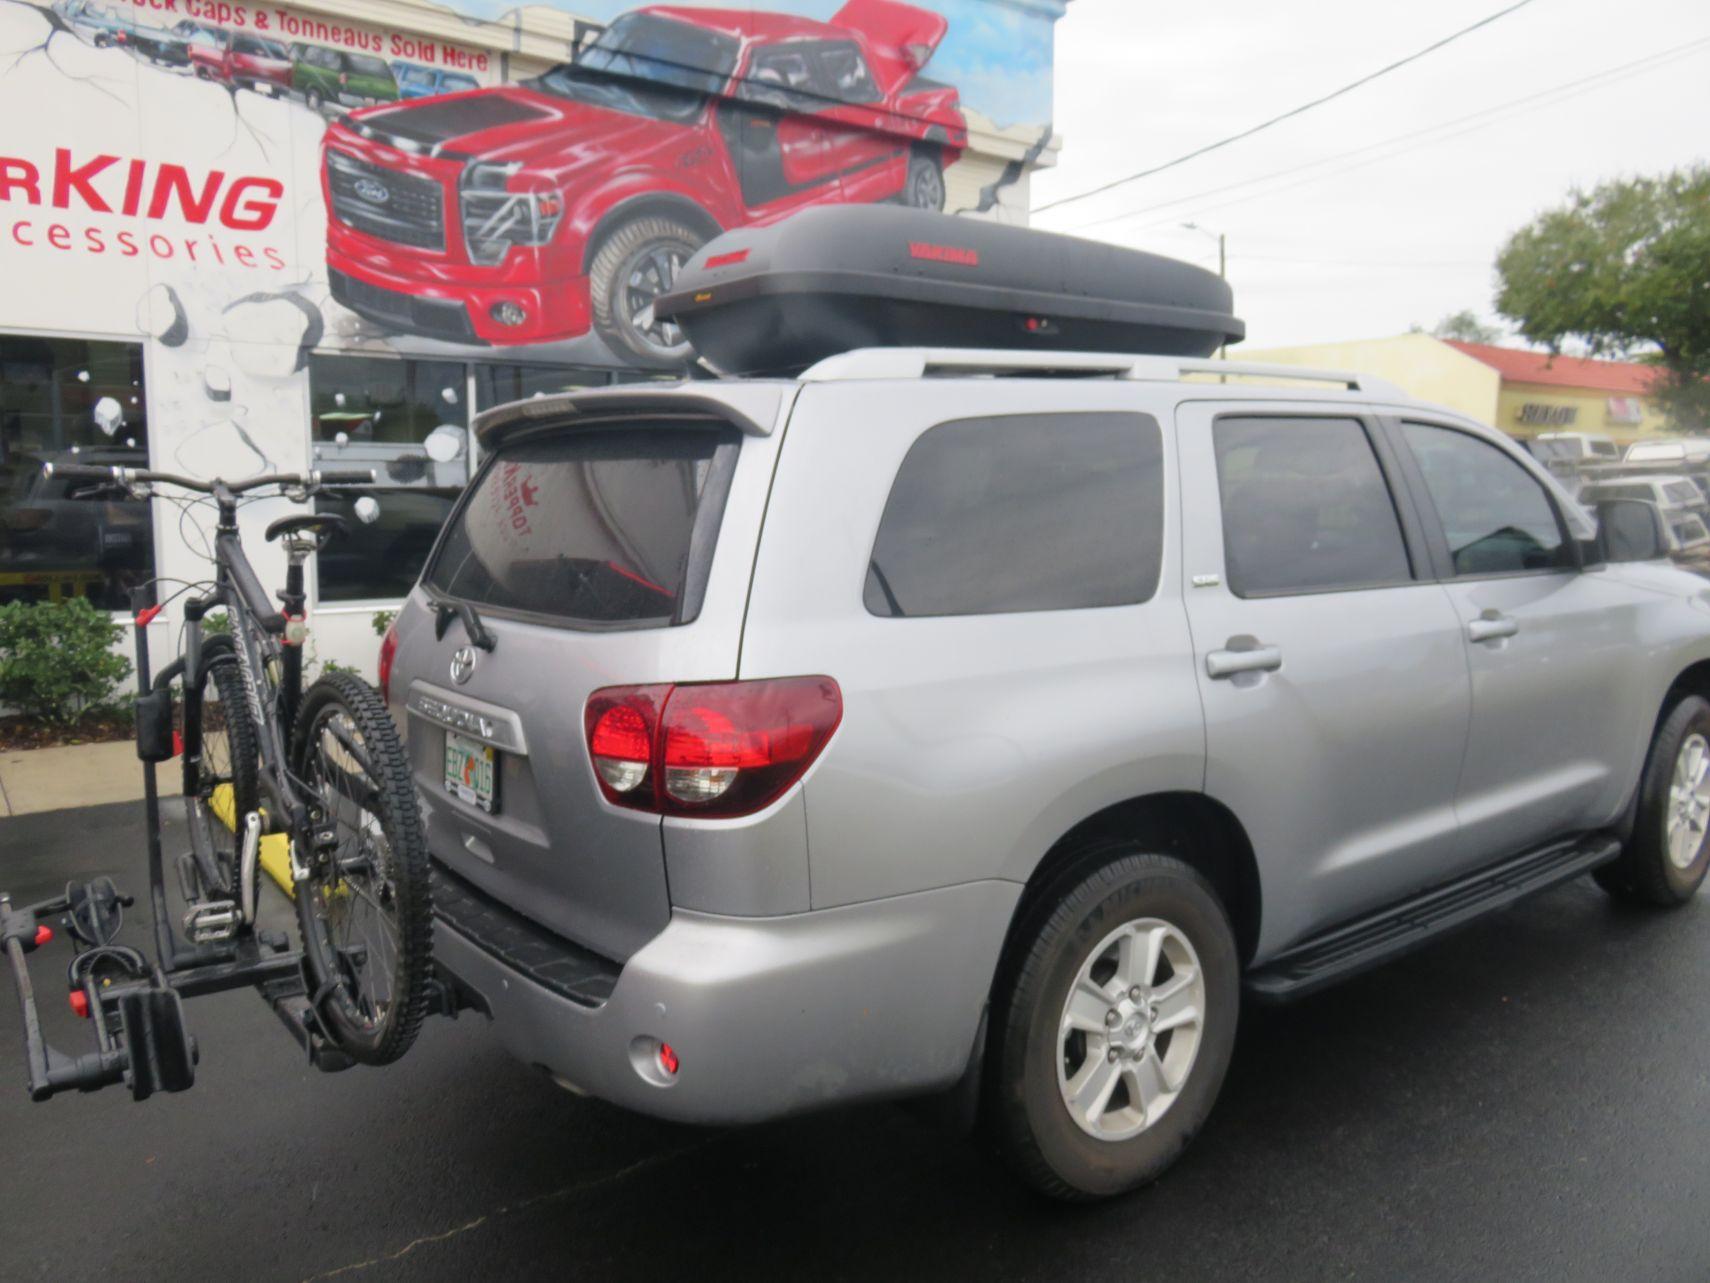 2018 Toyota Sequioa Yakima Storage Custom Hitch Bike Rack, Black out Nerf Bars by TopperKING in Brandon, FL 813-689-2449 or Clearwater, FL 727-530-9066.